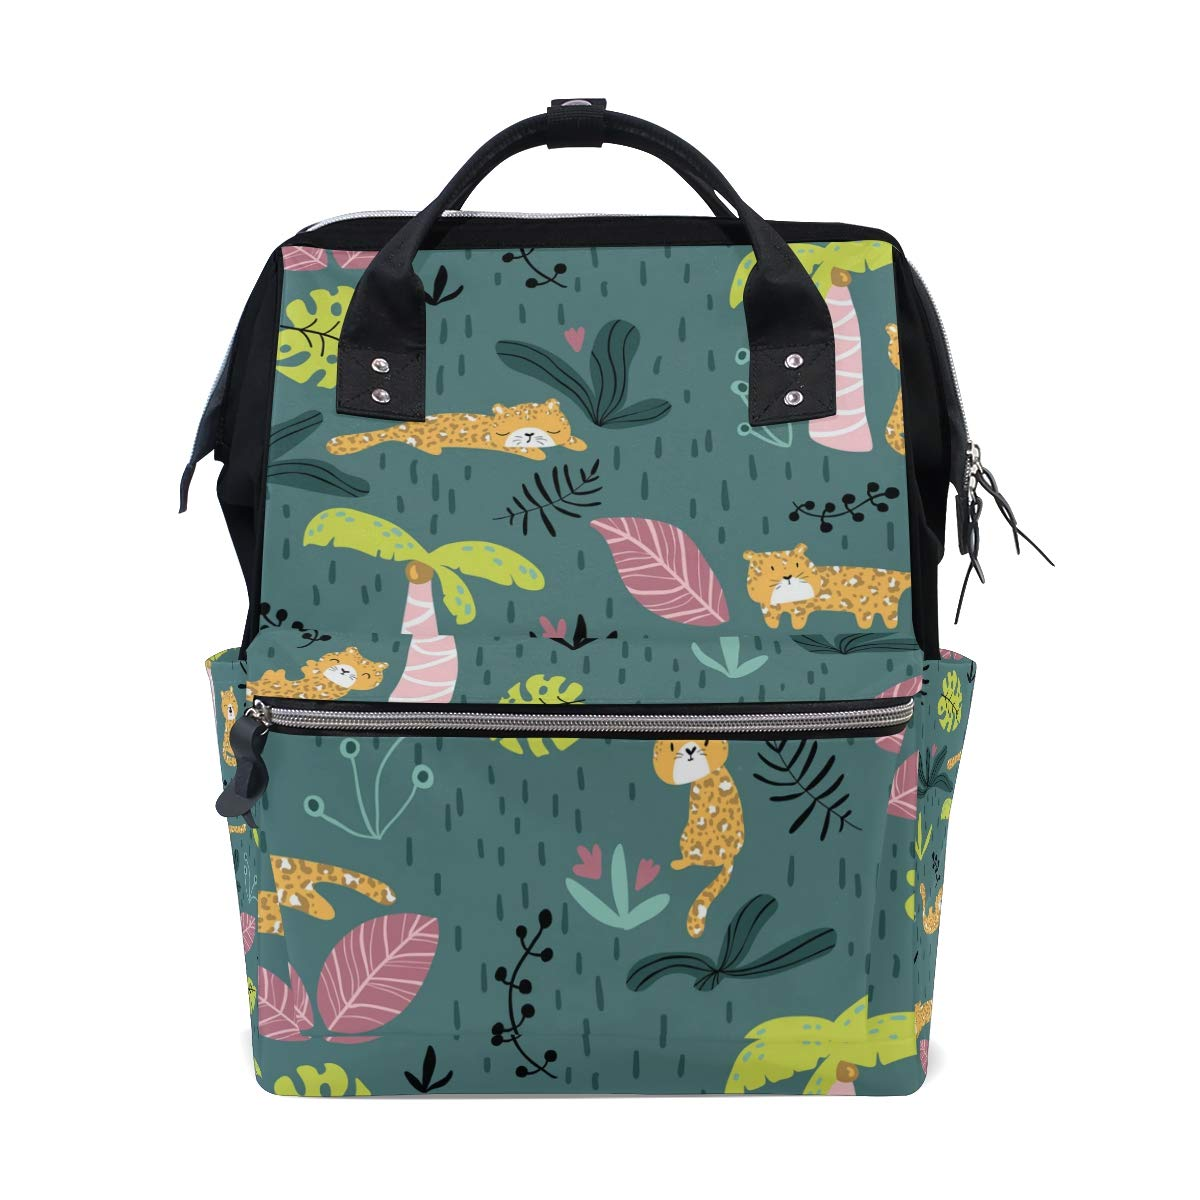 MERRYSUGAR Diaper Bag Backpack Forest Cheetah Green Multifunction Travel Bag